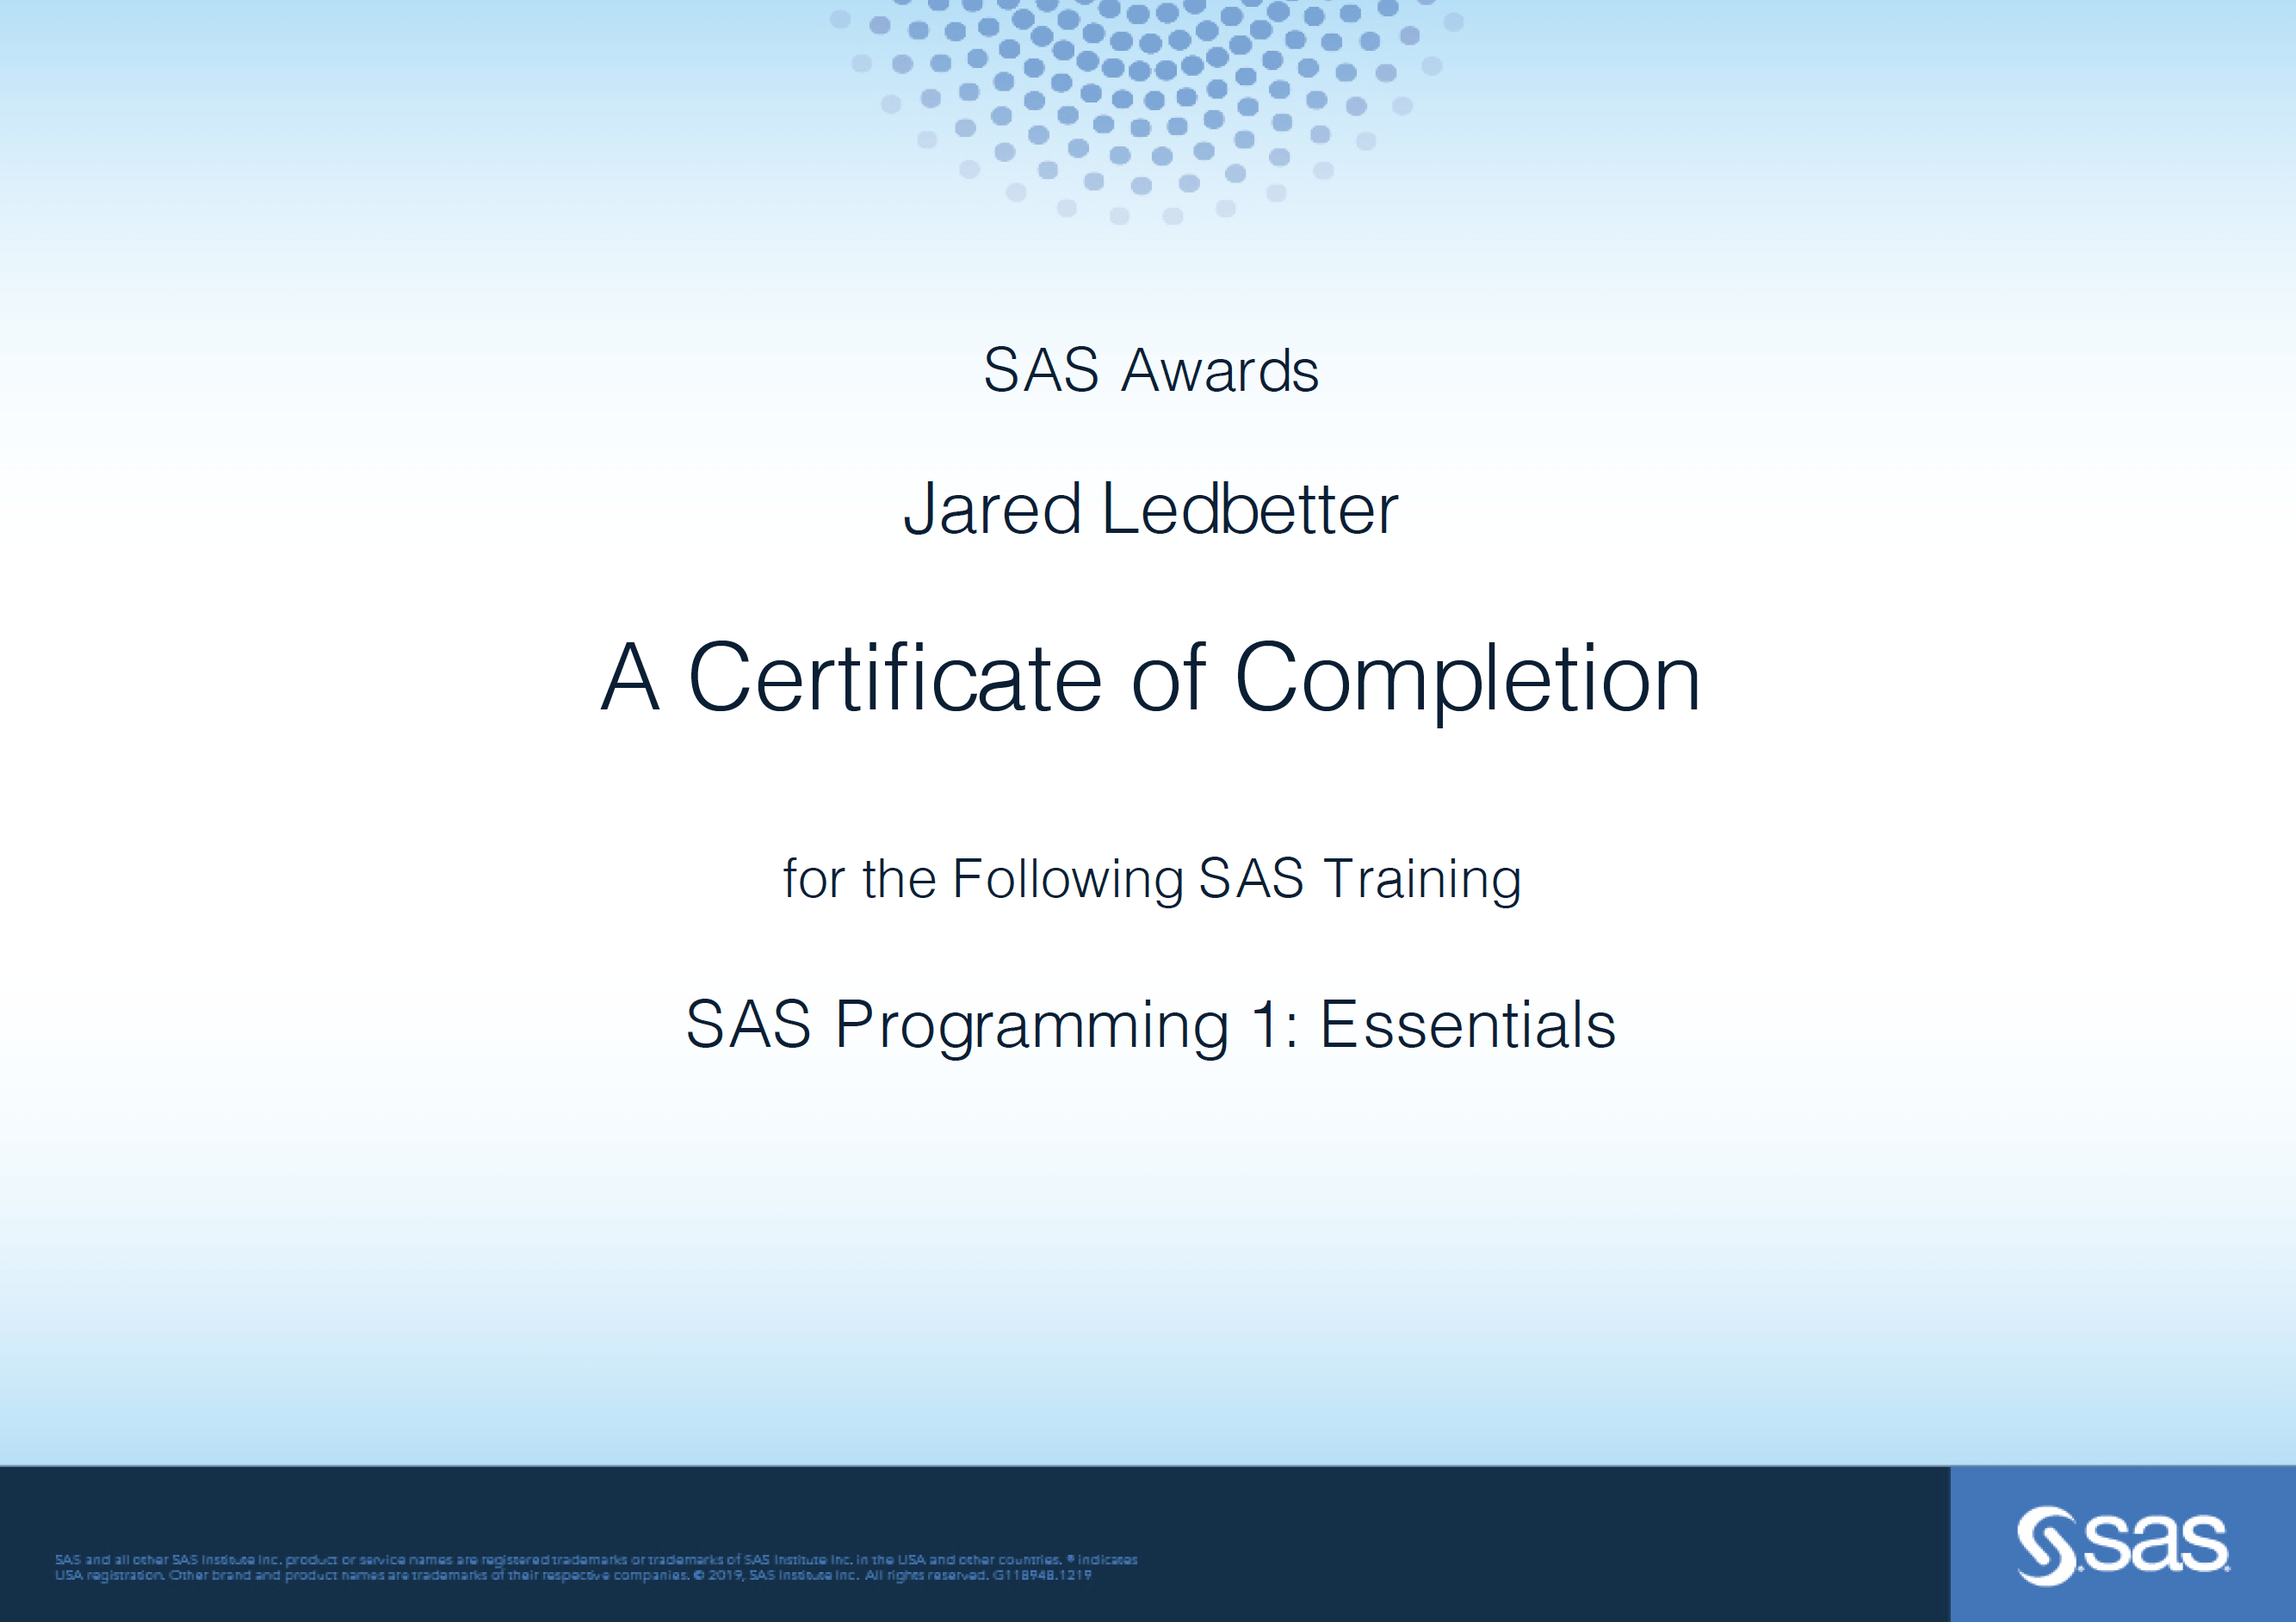 SAS Programming 1 - Essentials Cert 20200519